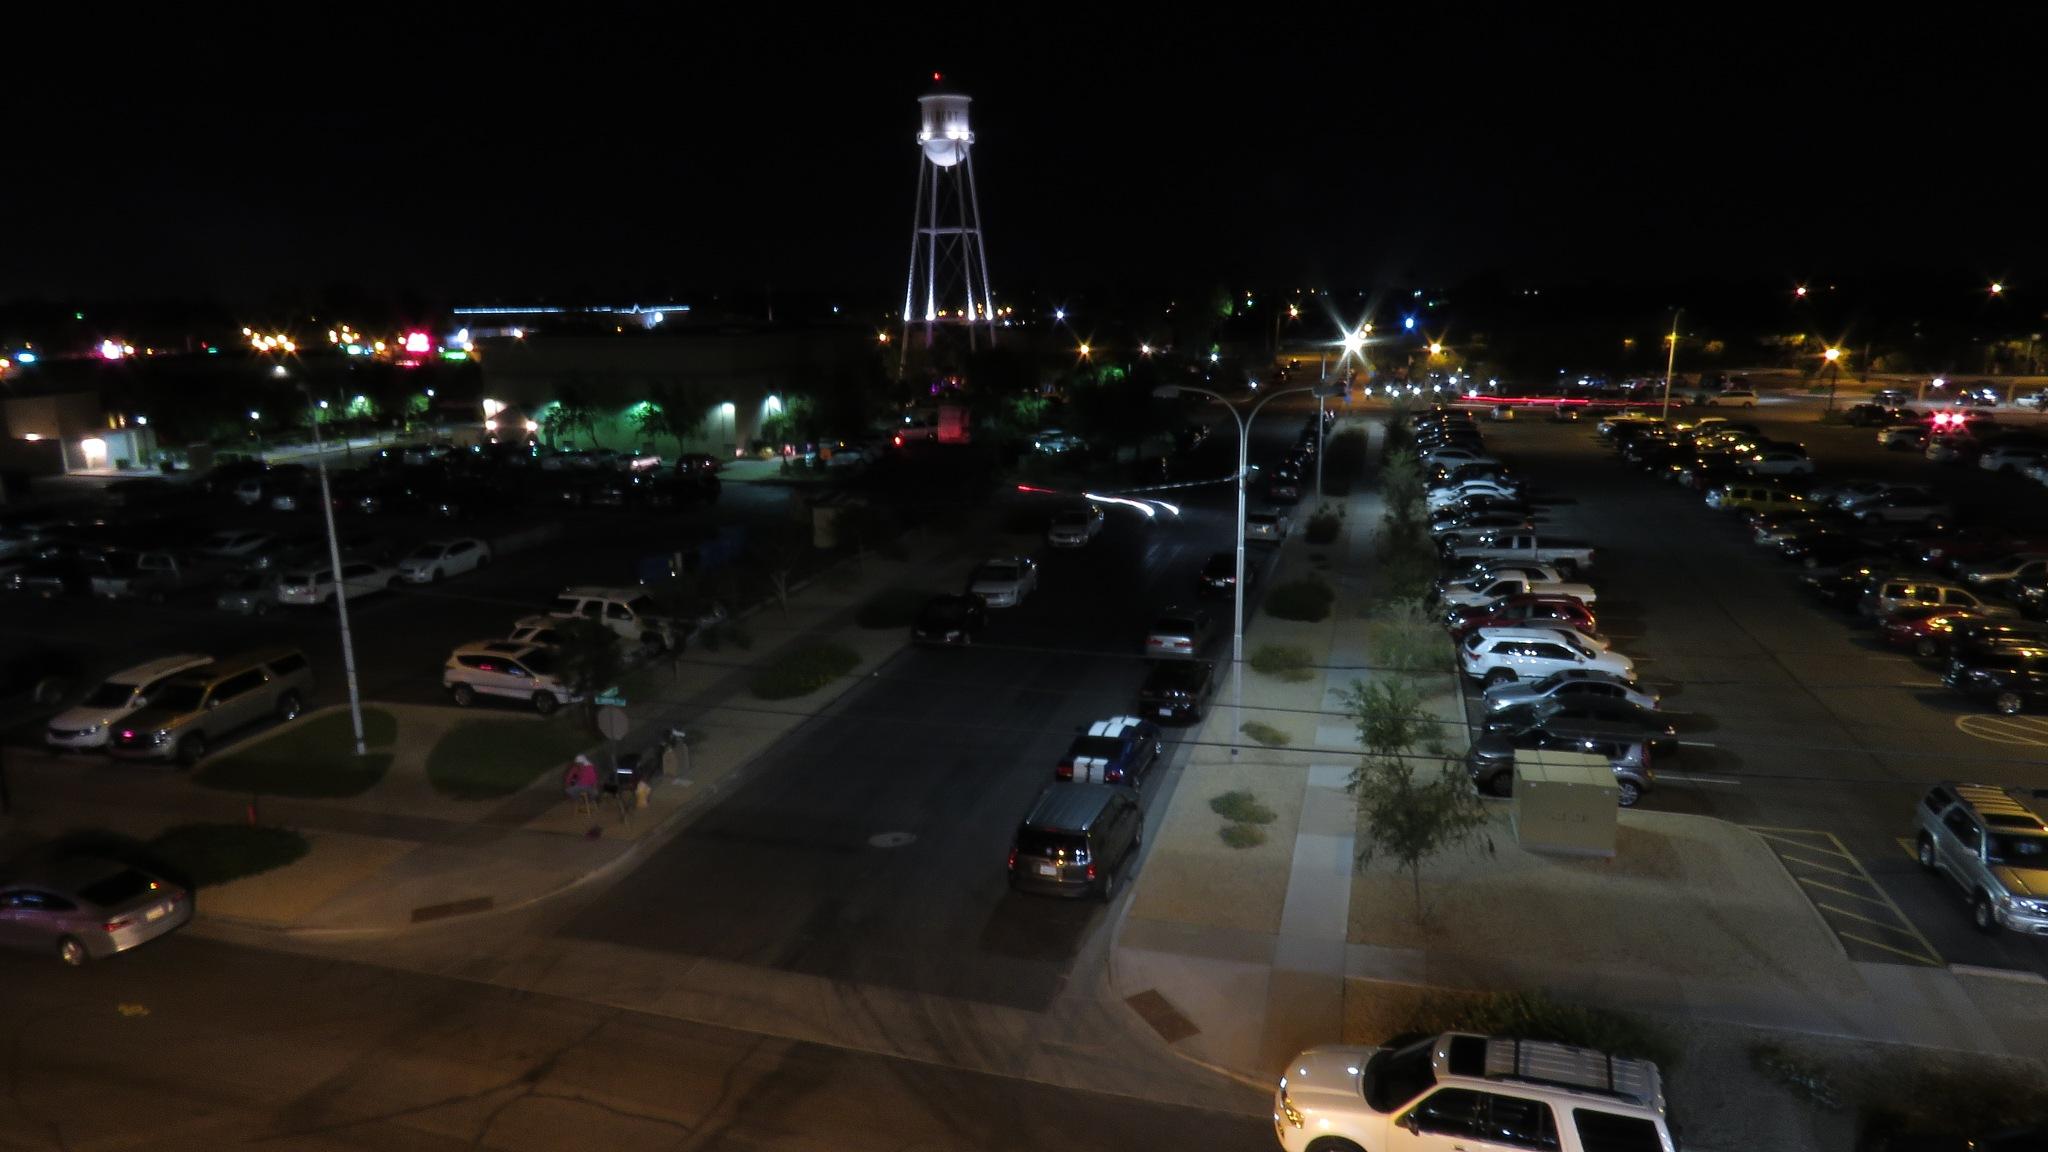 Gilbert Arizona by night by Terry Smith